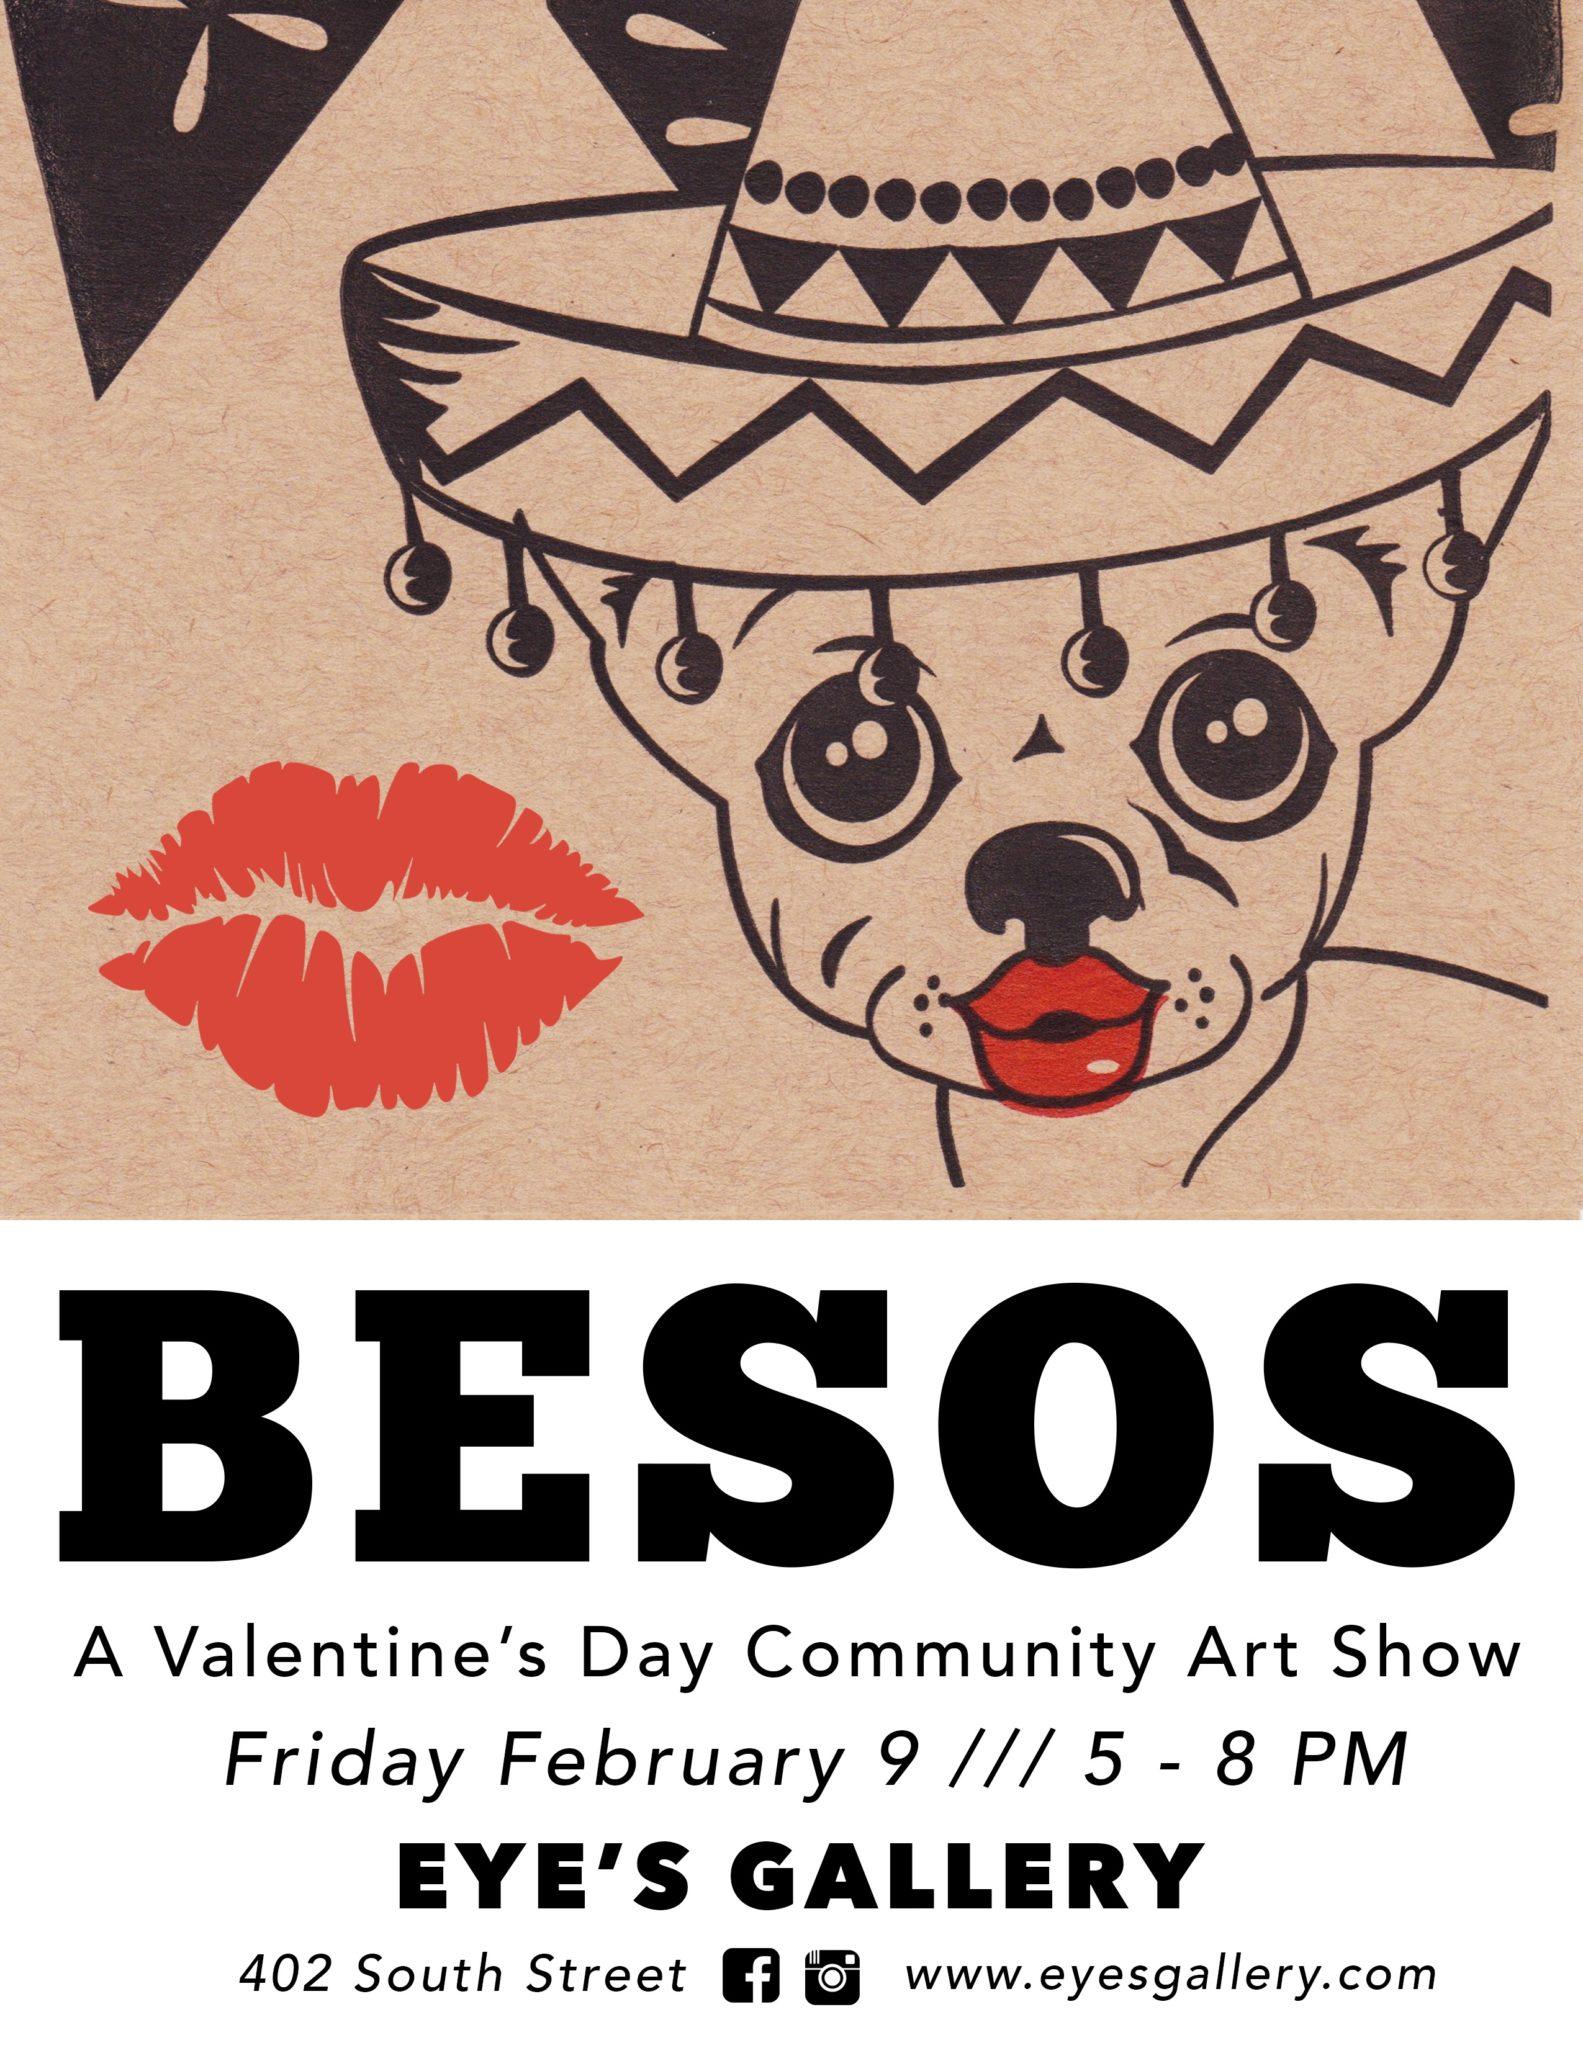 Besos: A Valentine's Day Community Art Show